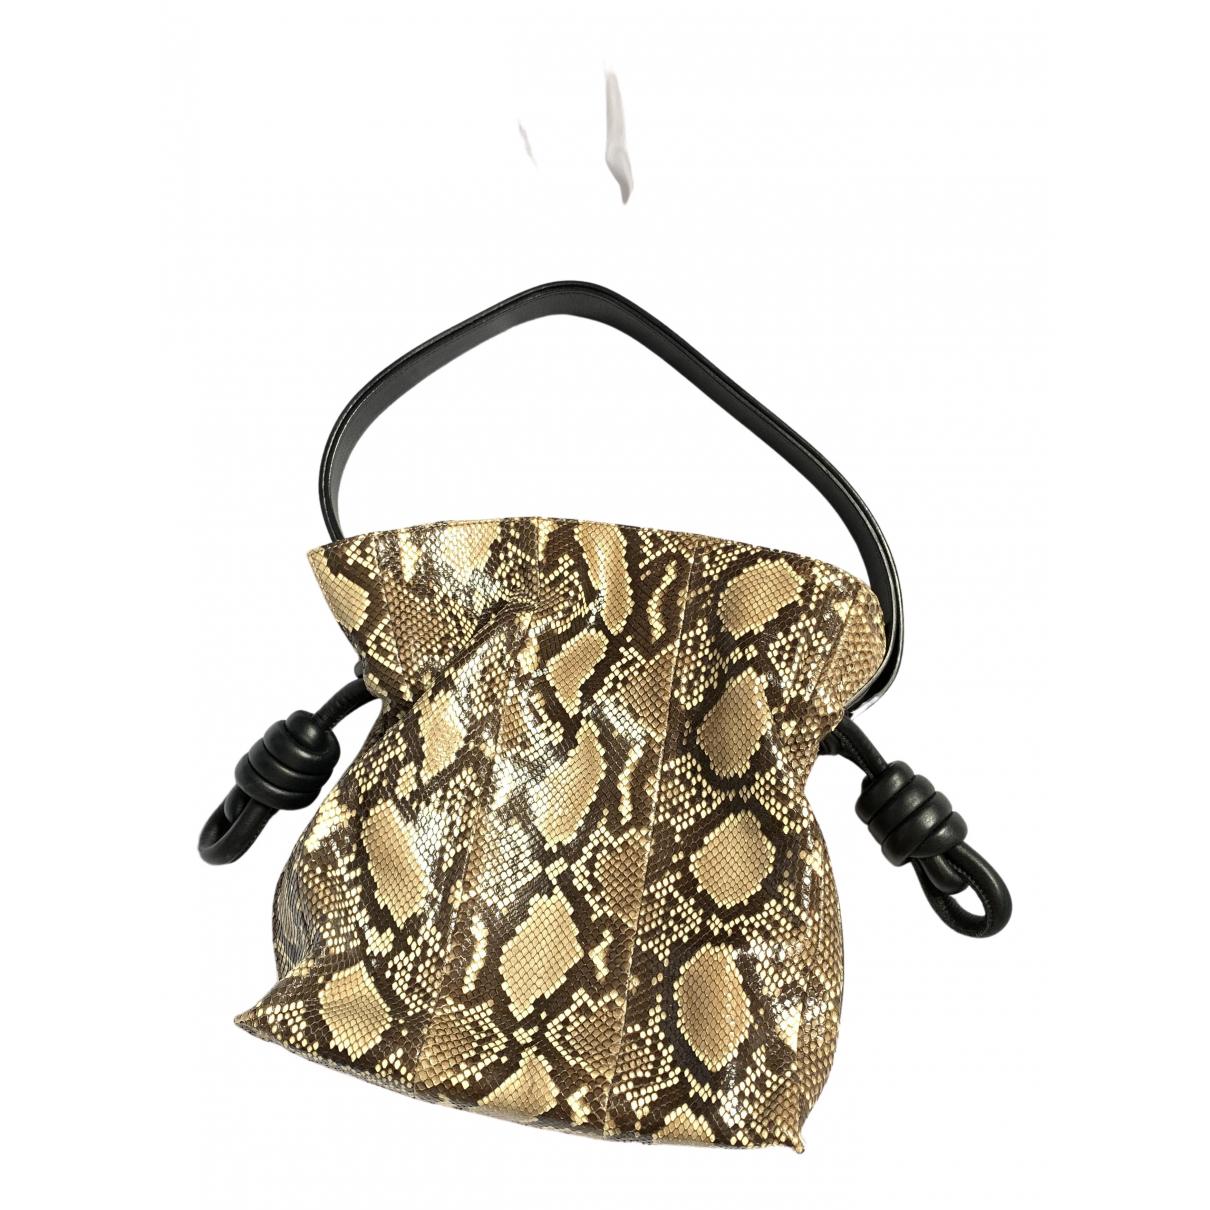 Loewe Flamenco Multicolour Python handbag for Women \N